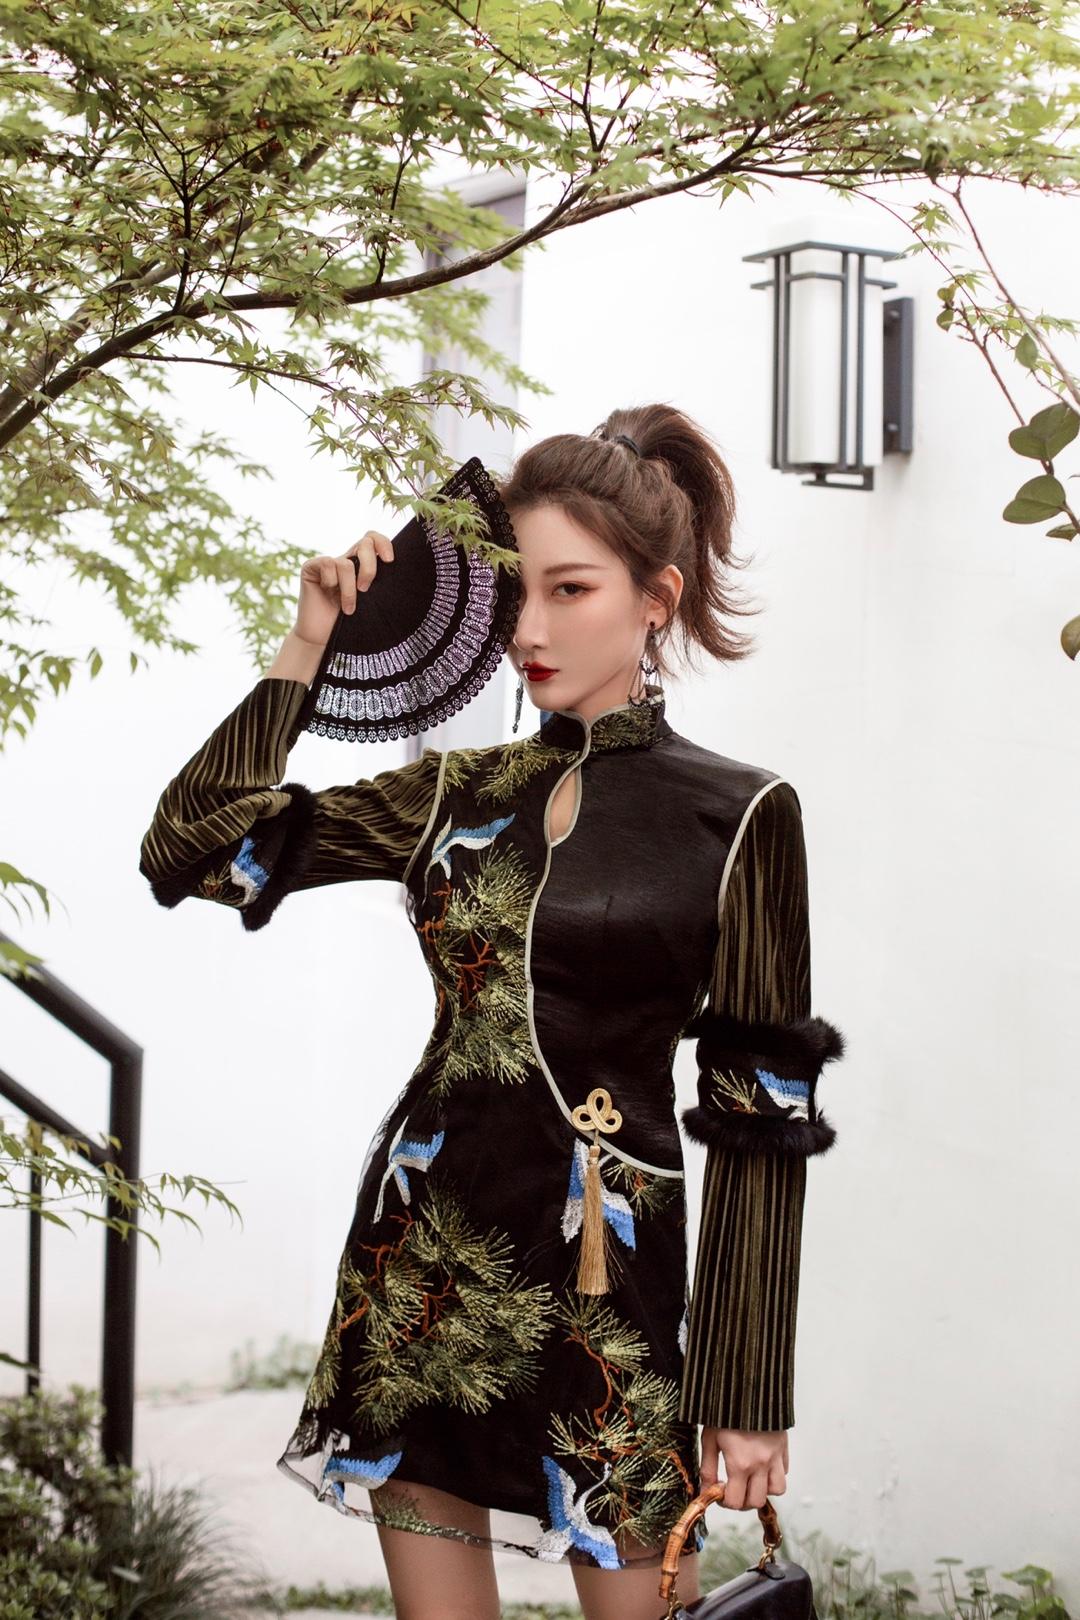 OOTD|在乌镇拍高级感中国风旗袍LOOK 真的很喜欢乌镇古色古香的氛围,拍的两套旗袍也很出片。利用好周围环境的元素跟道具,可以拍出不一样的片子。 OOTD: 旗袍:SIJIN STUDIO 扇子:Vivienne Tam 靴子:Lost in echo 包包:GUCCI中古竹节包 耳饰:无边